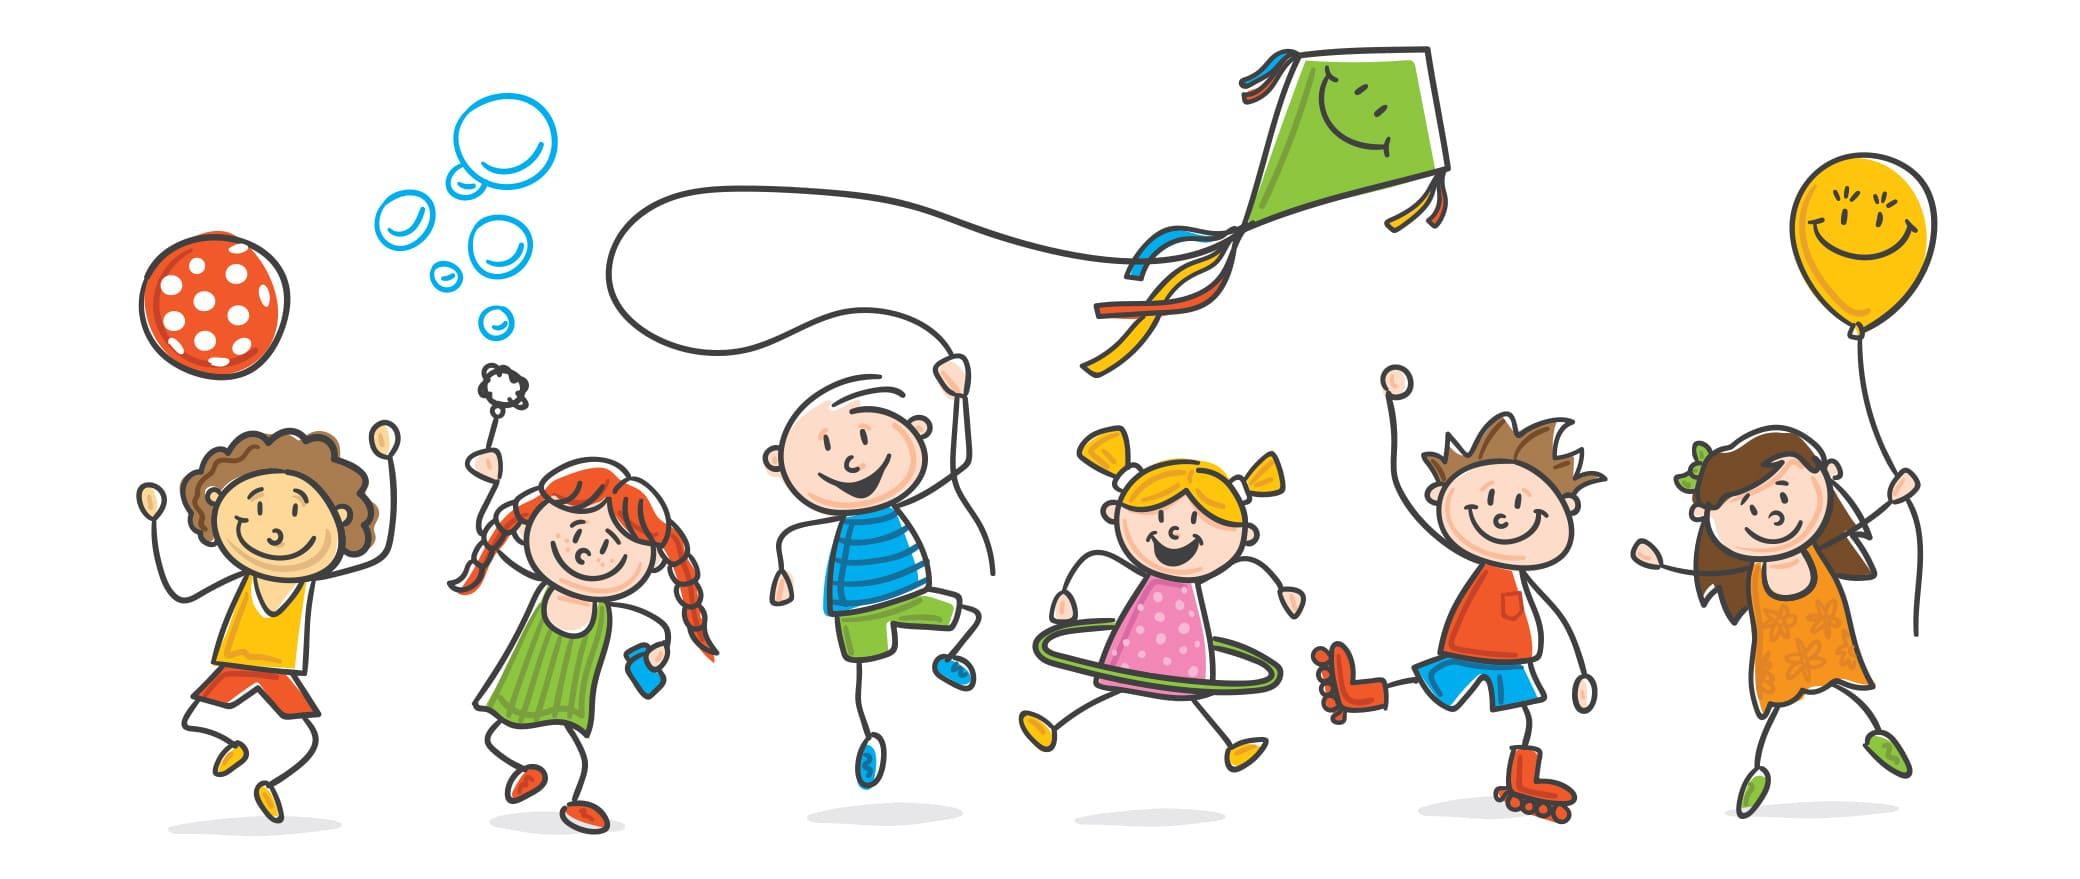 Incidentele opvang in Ridderkerk - Kinderdagverblijf de Bron